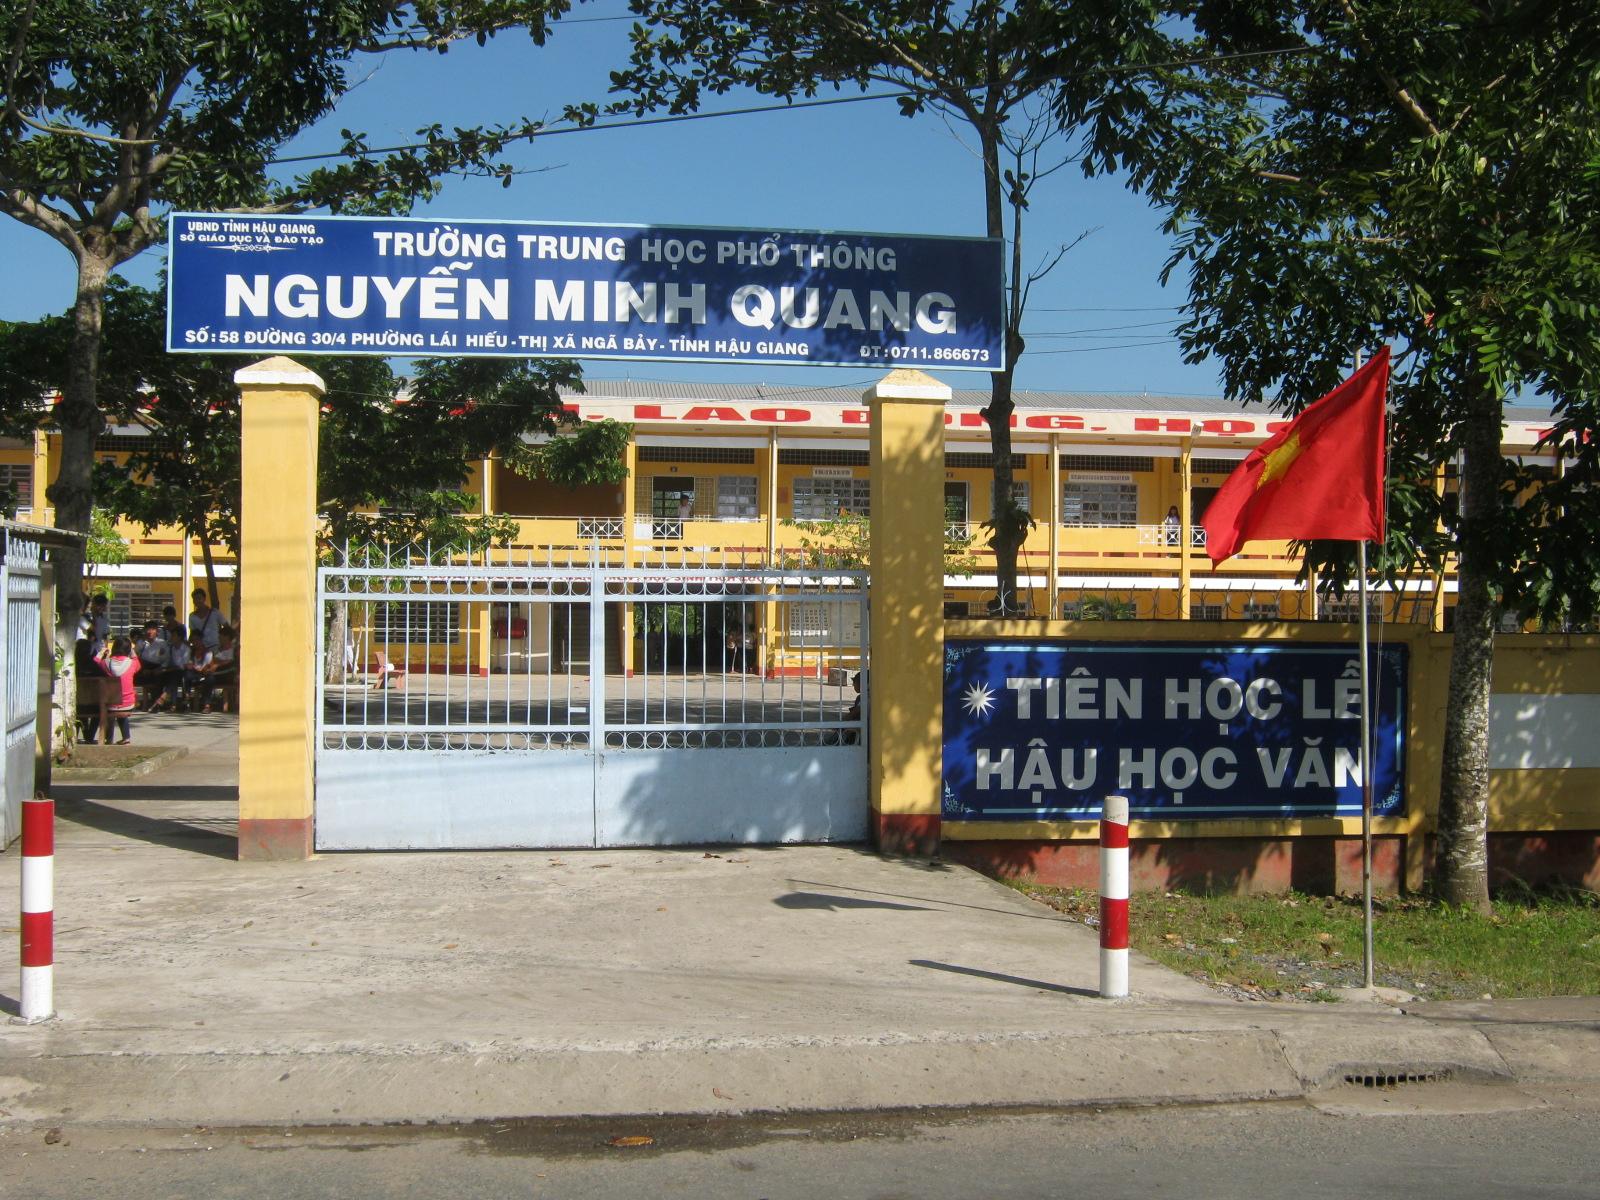 Truong-THPT-Nguyen-Minh-Quang